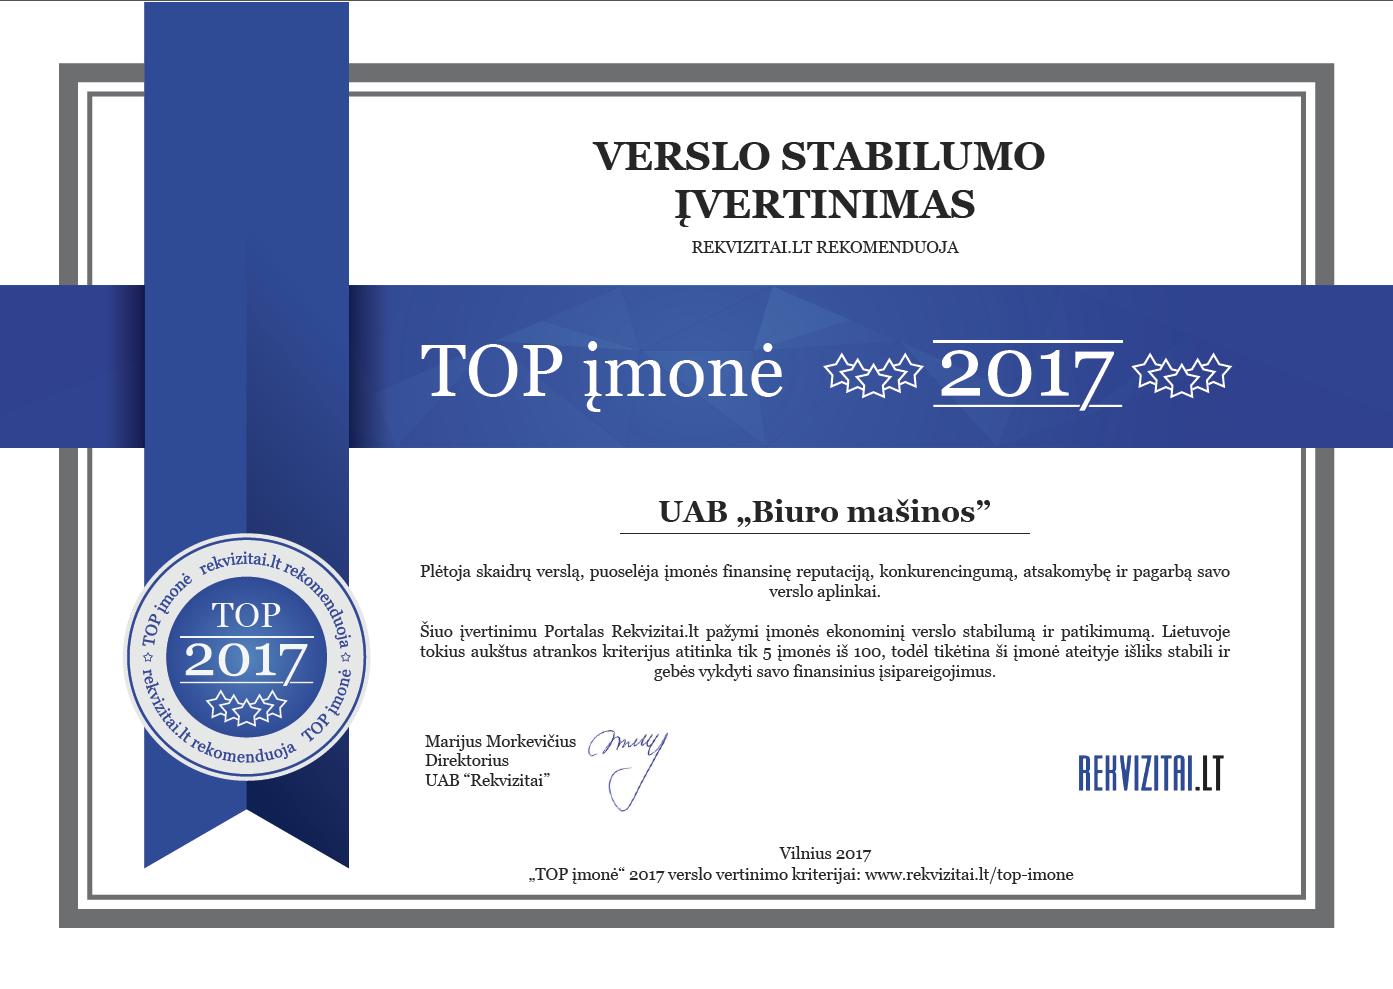 Biuro masinos TOP imone 2017